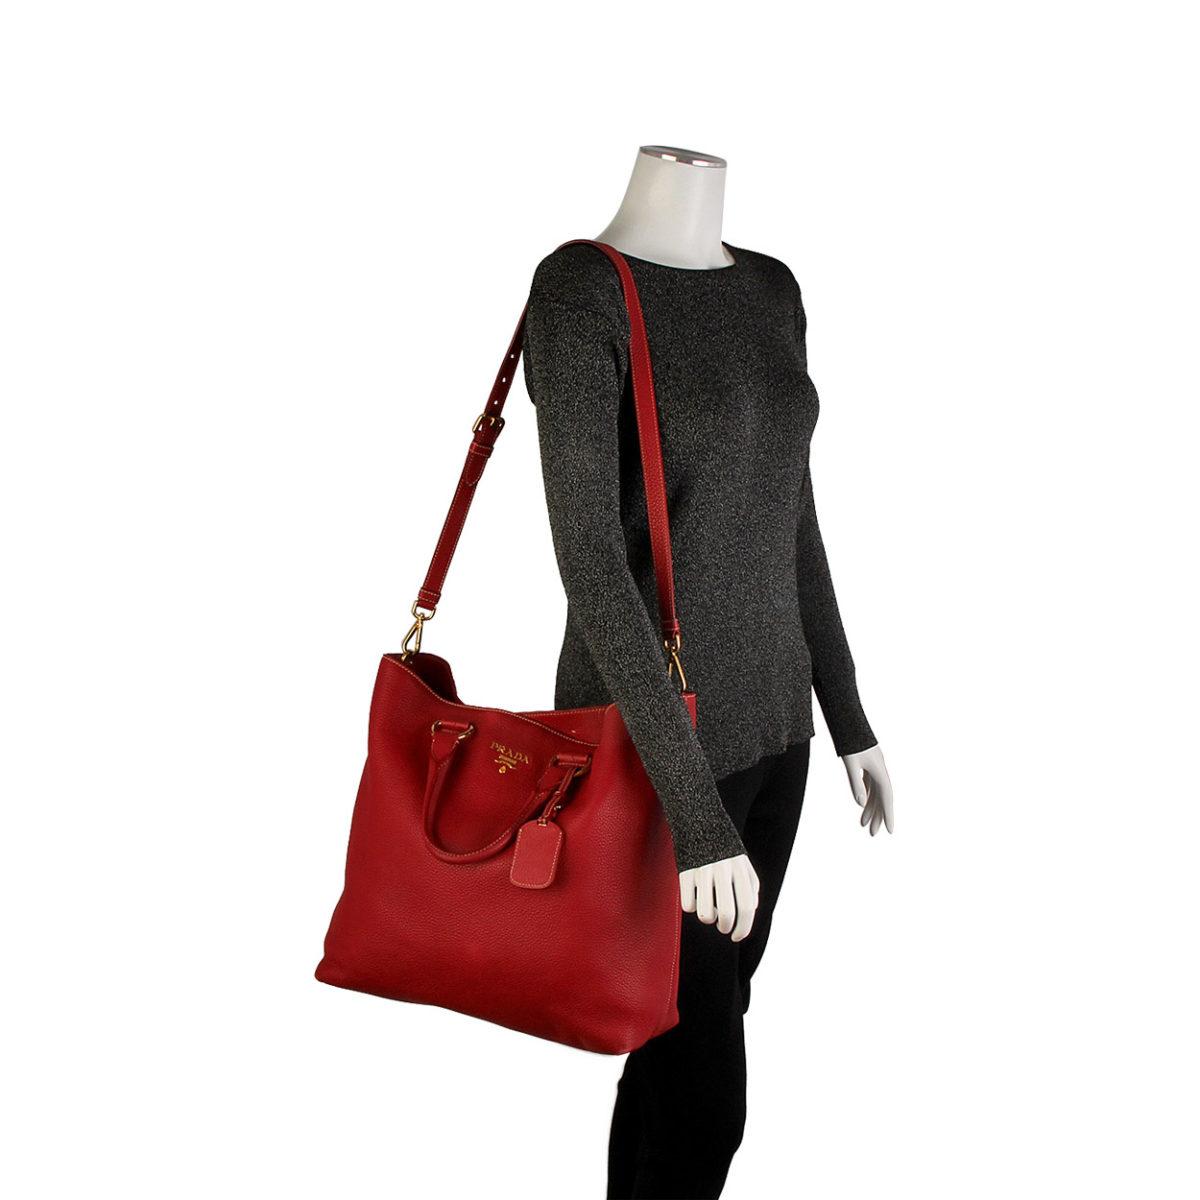 1b11c85bf6ae PRADA Vitello Daino Large Shopper Tote Red | Luxity